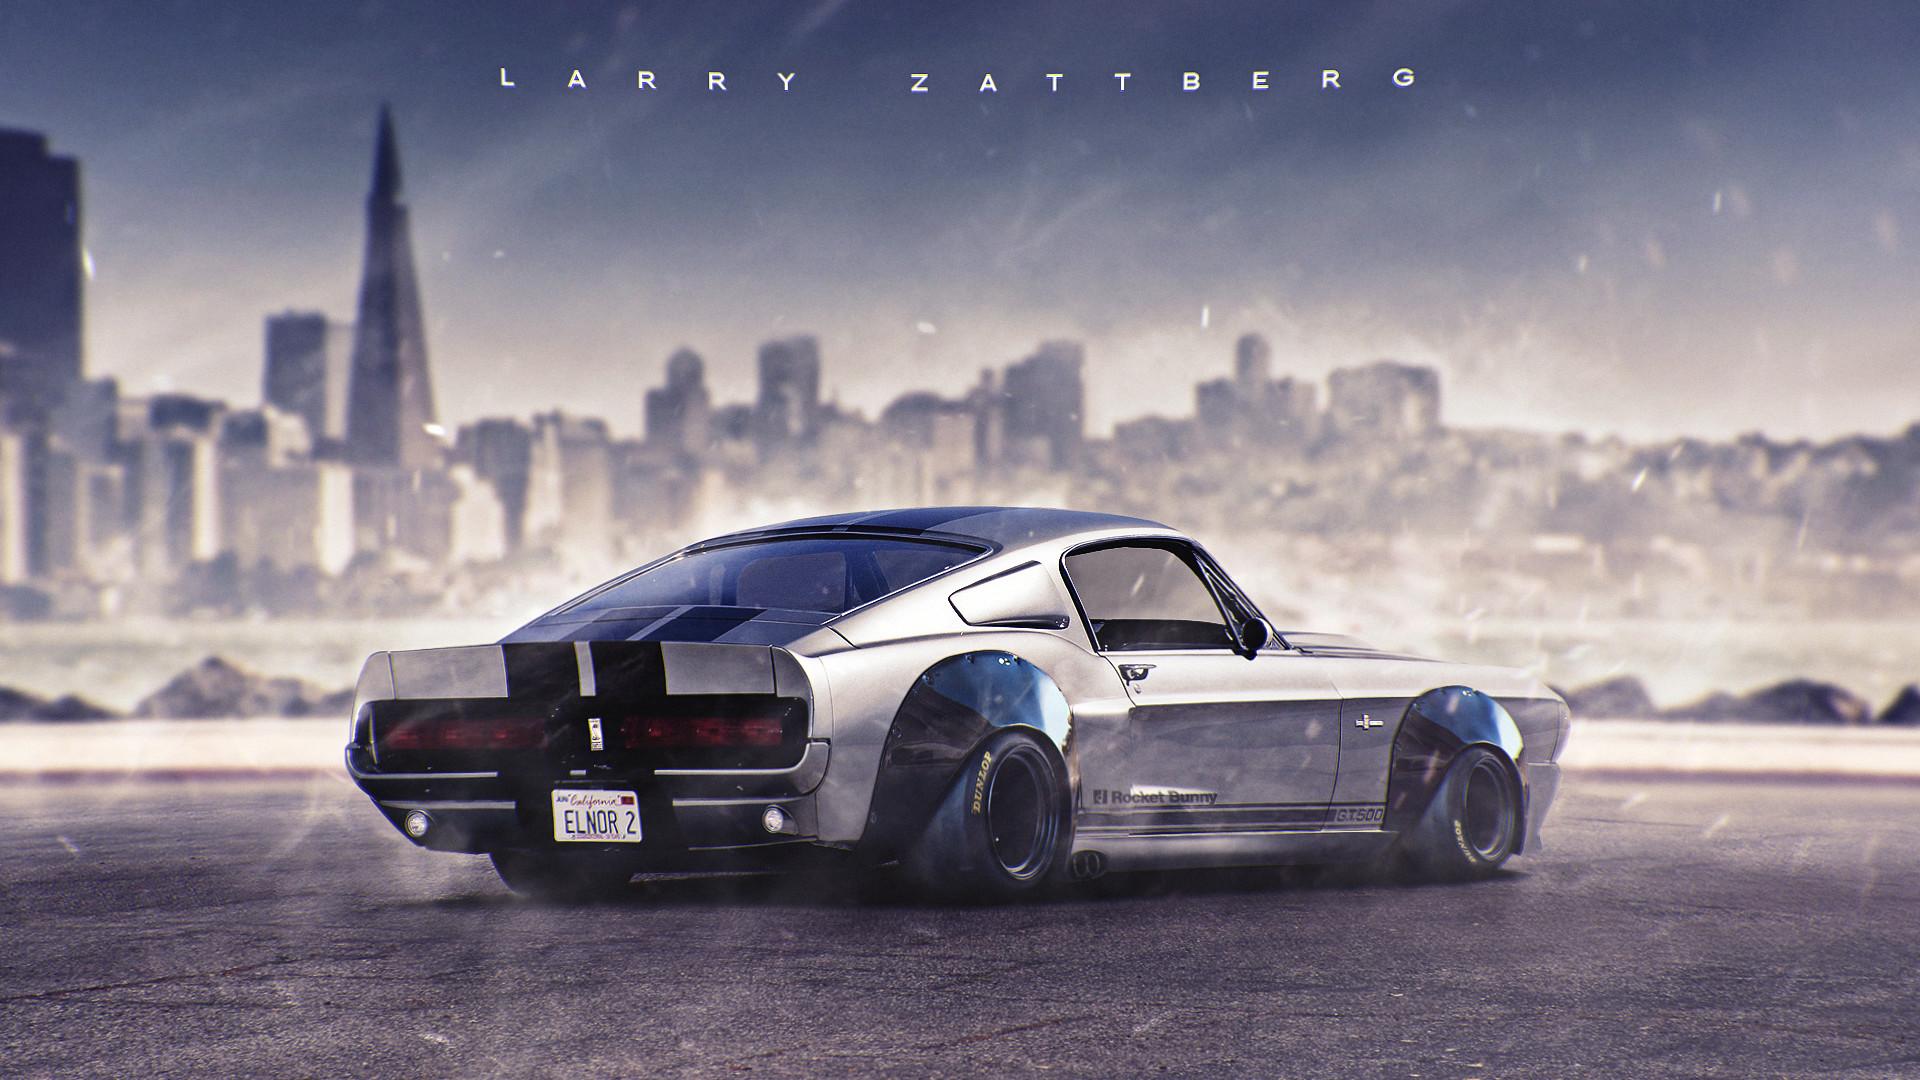 Larry Zattberg Mustang Gt500 Rocket Bunny